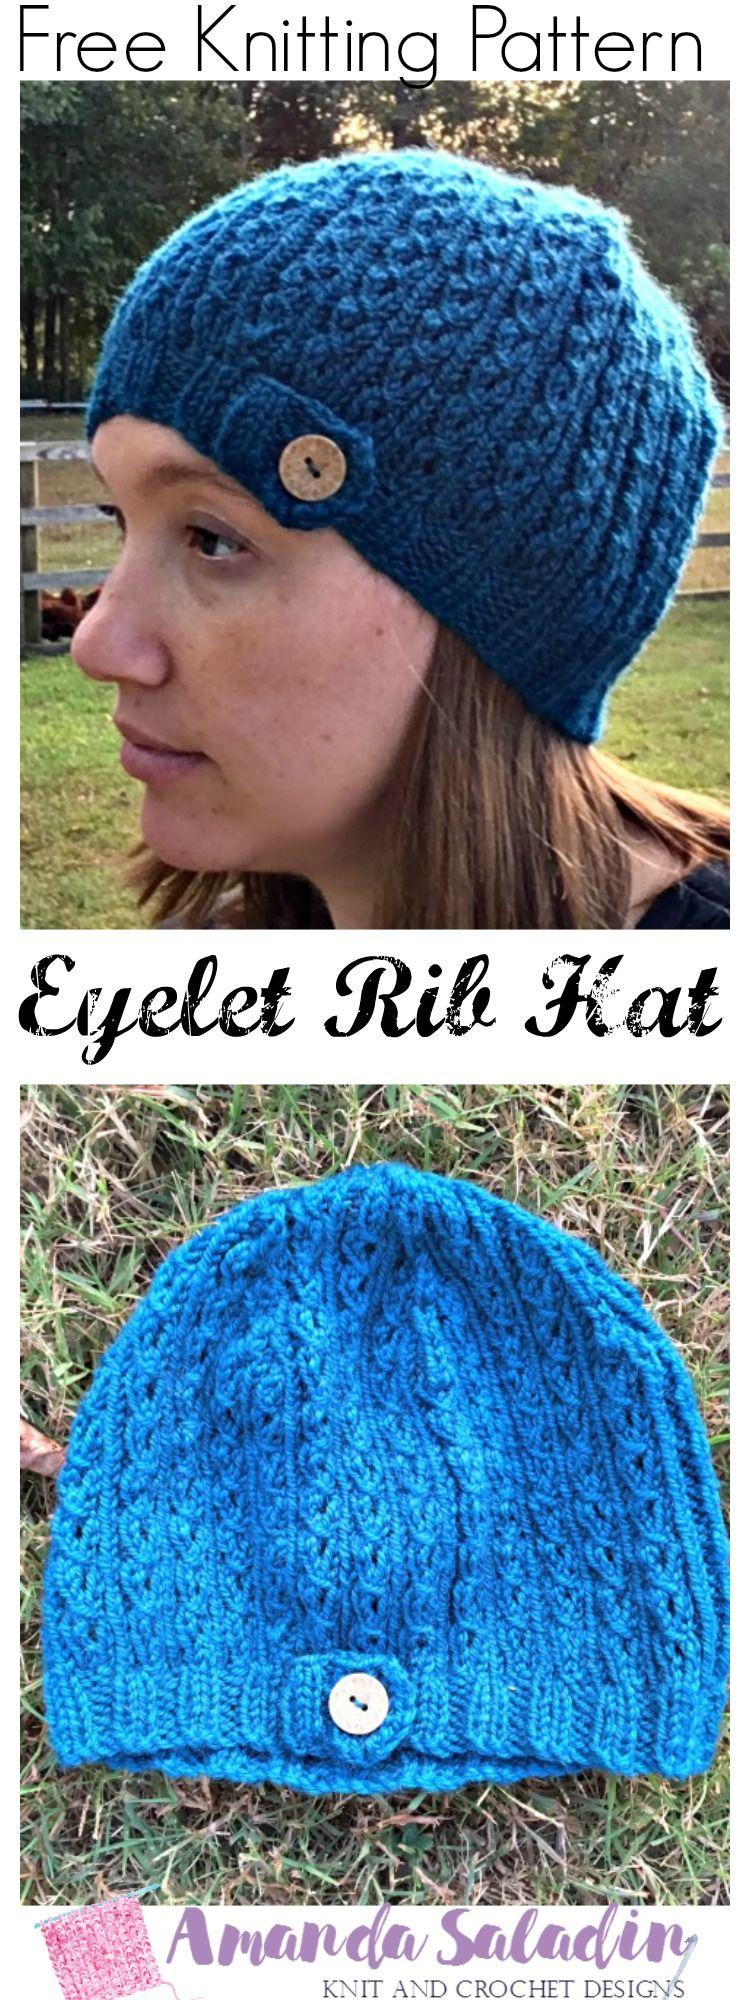 Eyelet Rib Knit Hat - Free Knitting Pattern | Knit hats, Free ...